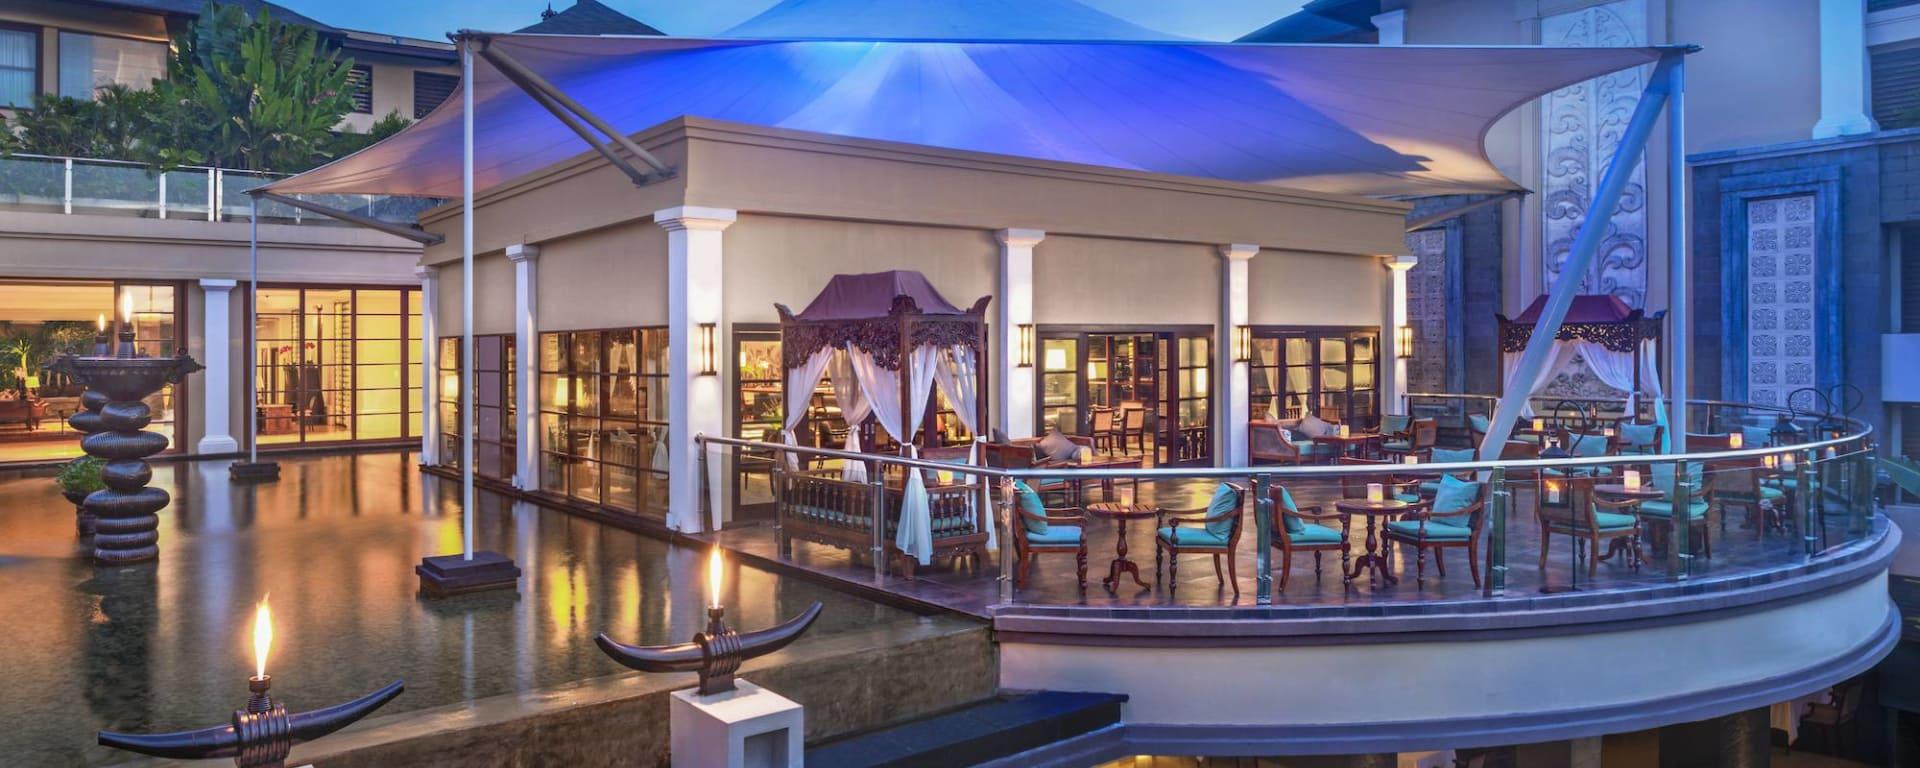 The St. Regis Bali Resort in Südbali: King Cole Bar Terrace at Dusk